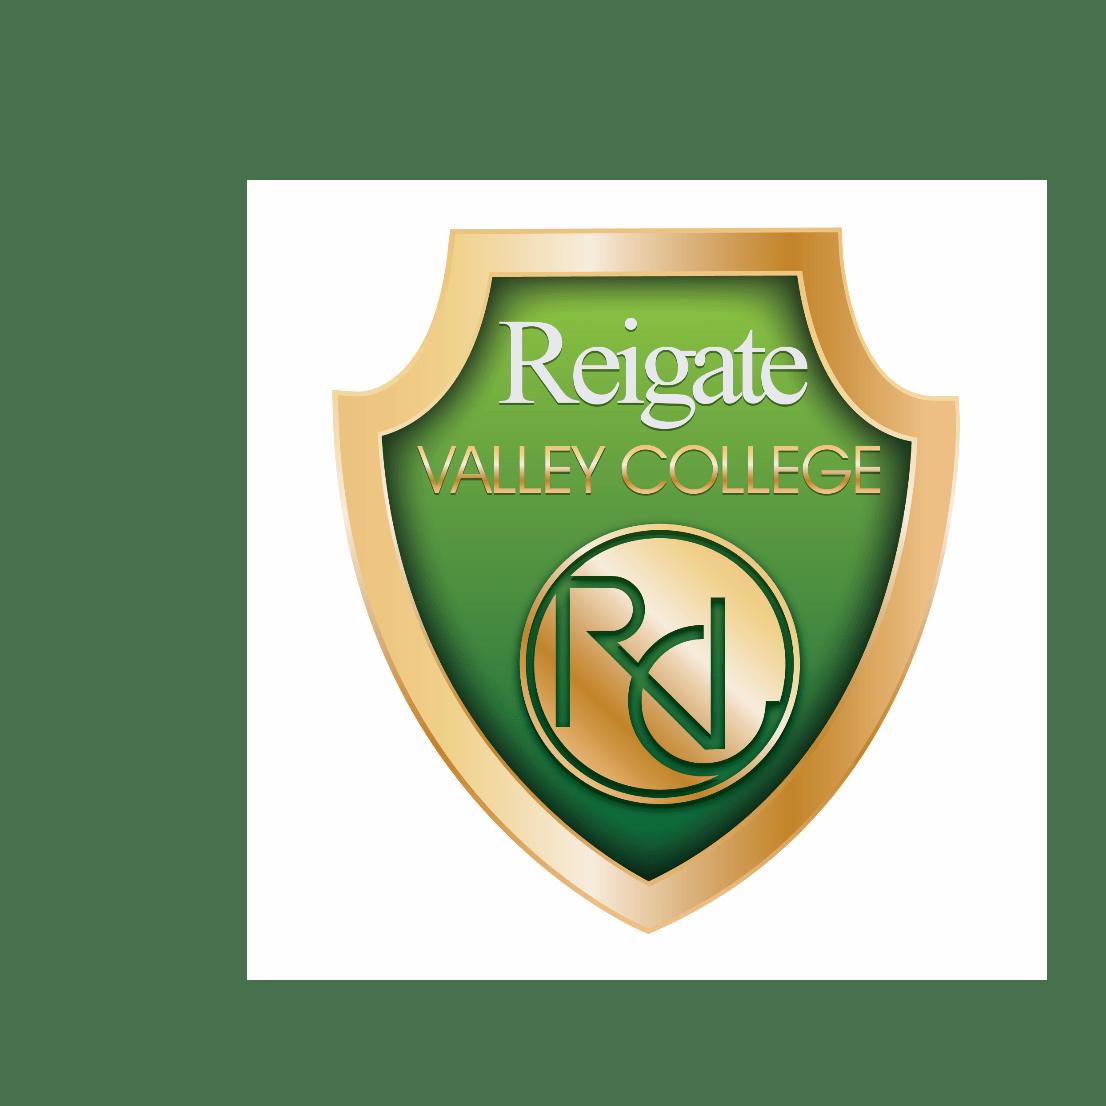 Reigate Valley College - Ironsbottom, Sidlow